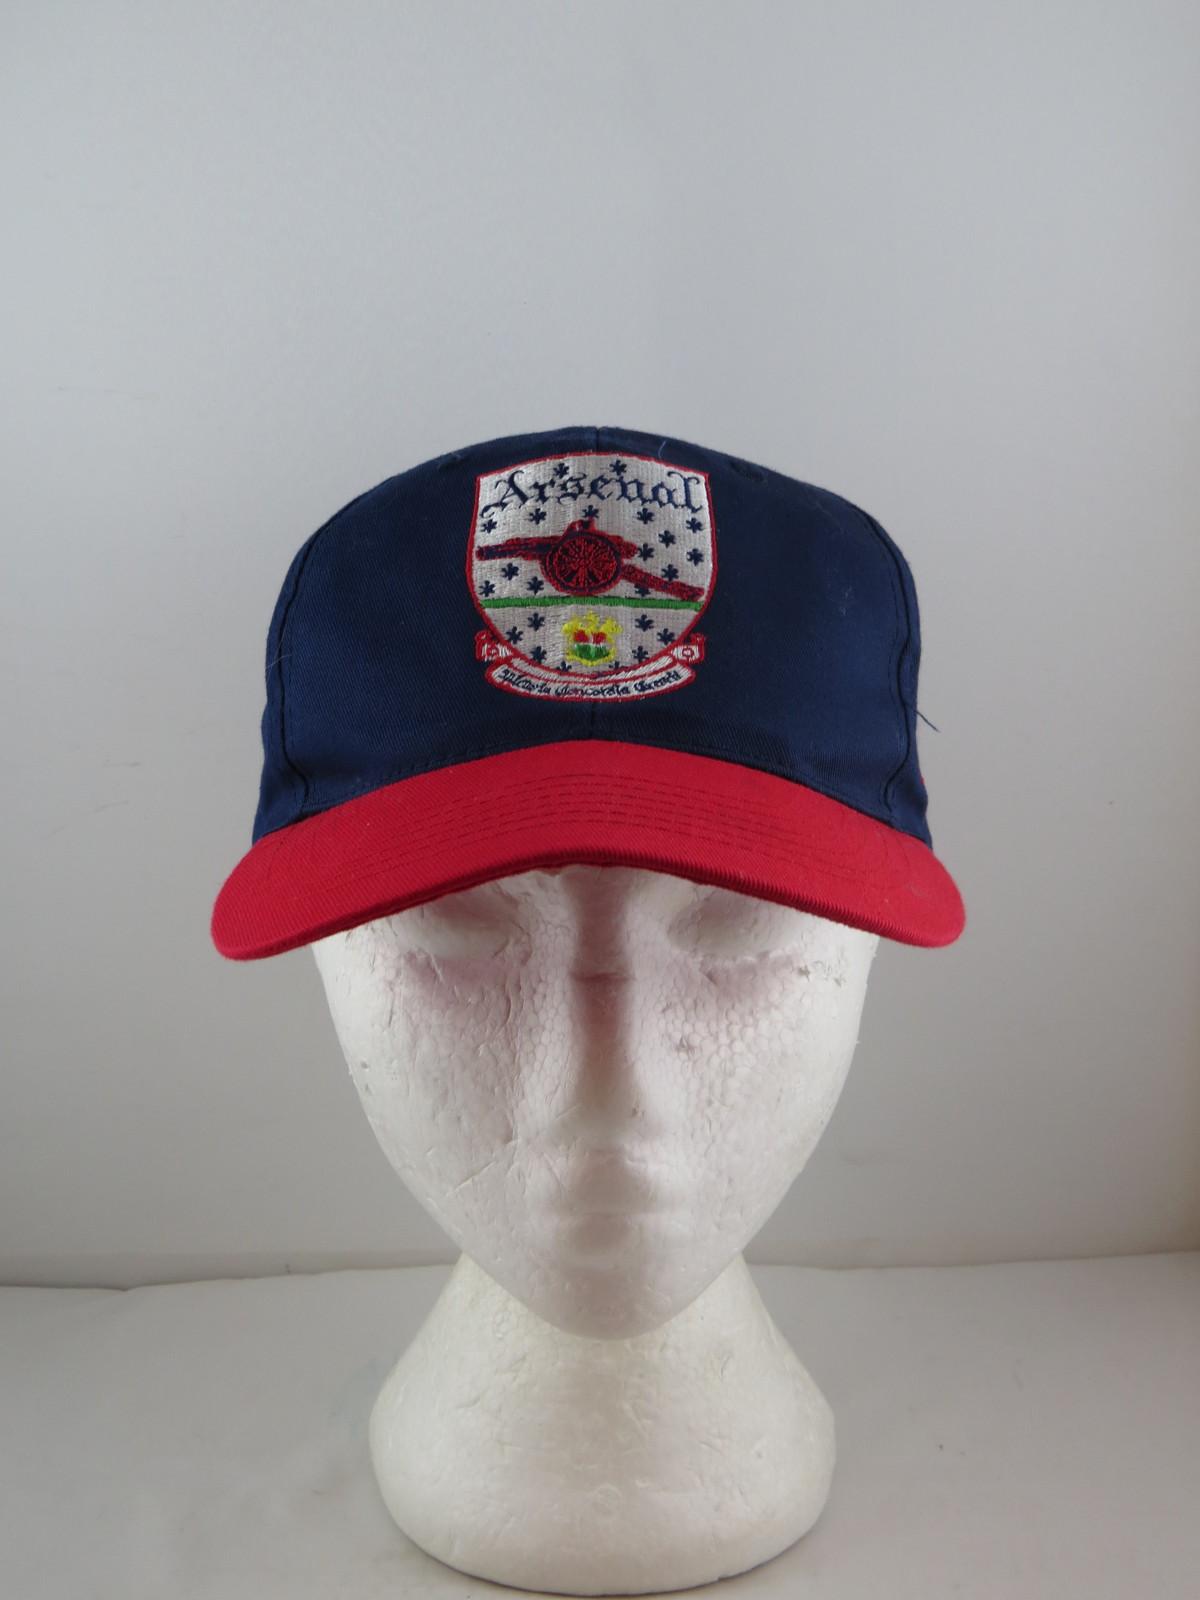 Vintage Arsenal Gunners Hat - Vintage Gunners Crest - Adult Snapback